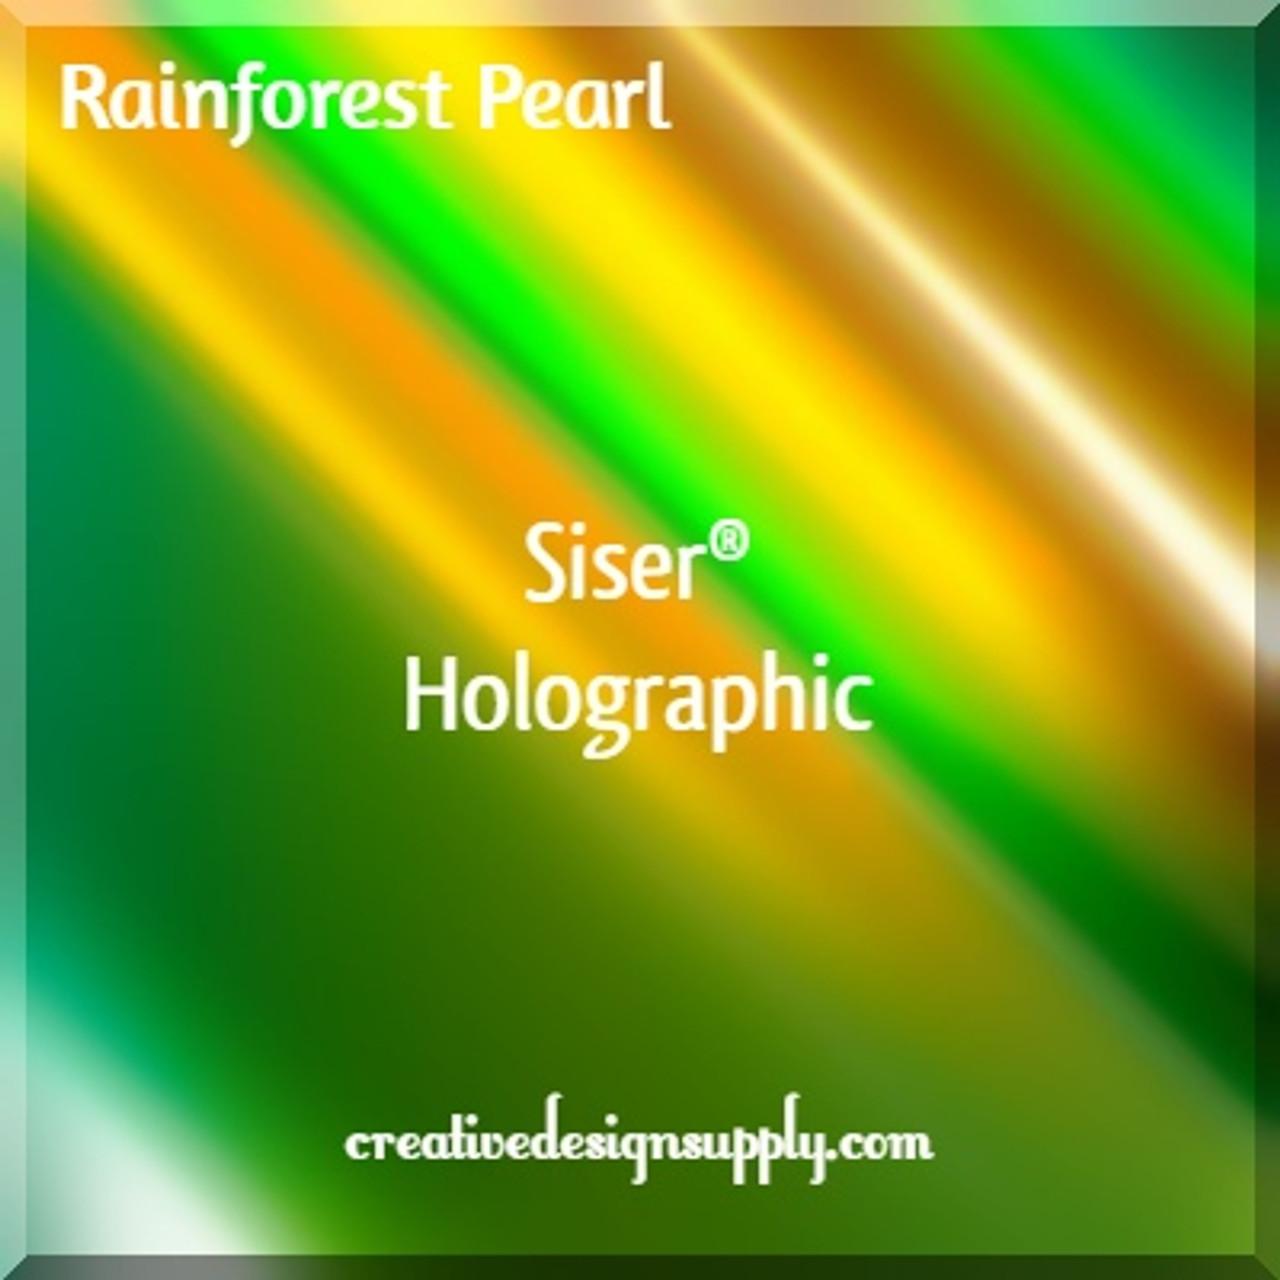 Siser® Holographic | Rainforest Pearl